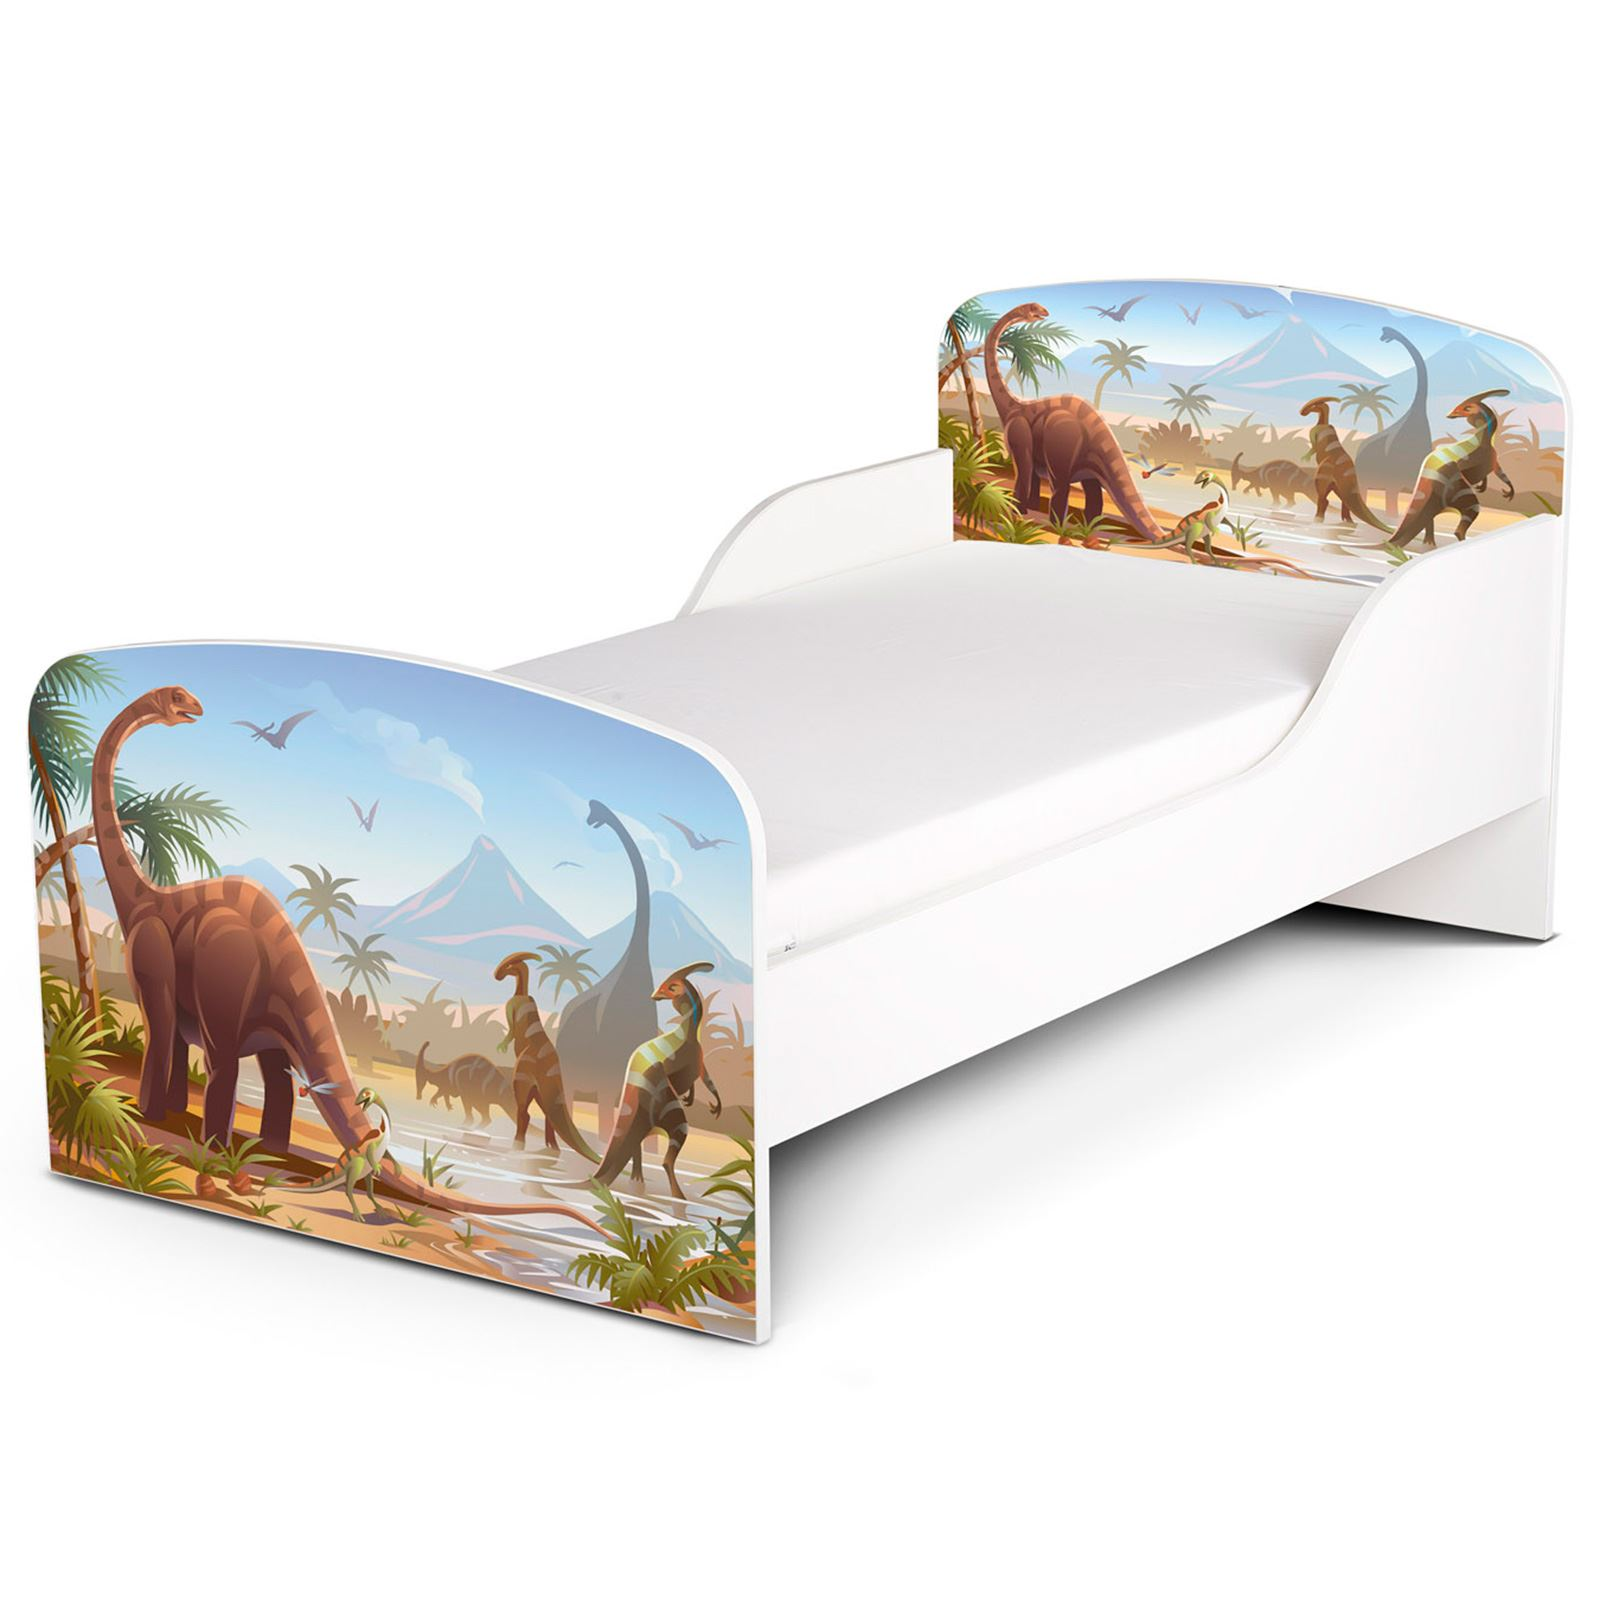 PRECIO Right Home Jurásico Dinosaurios Niño Gateador Cama con protector